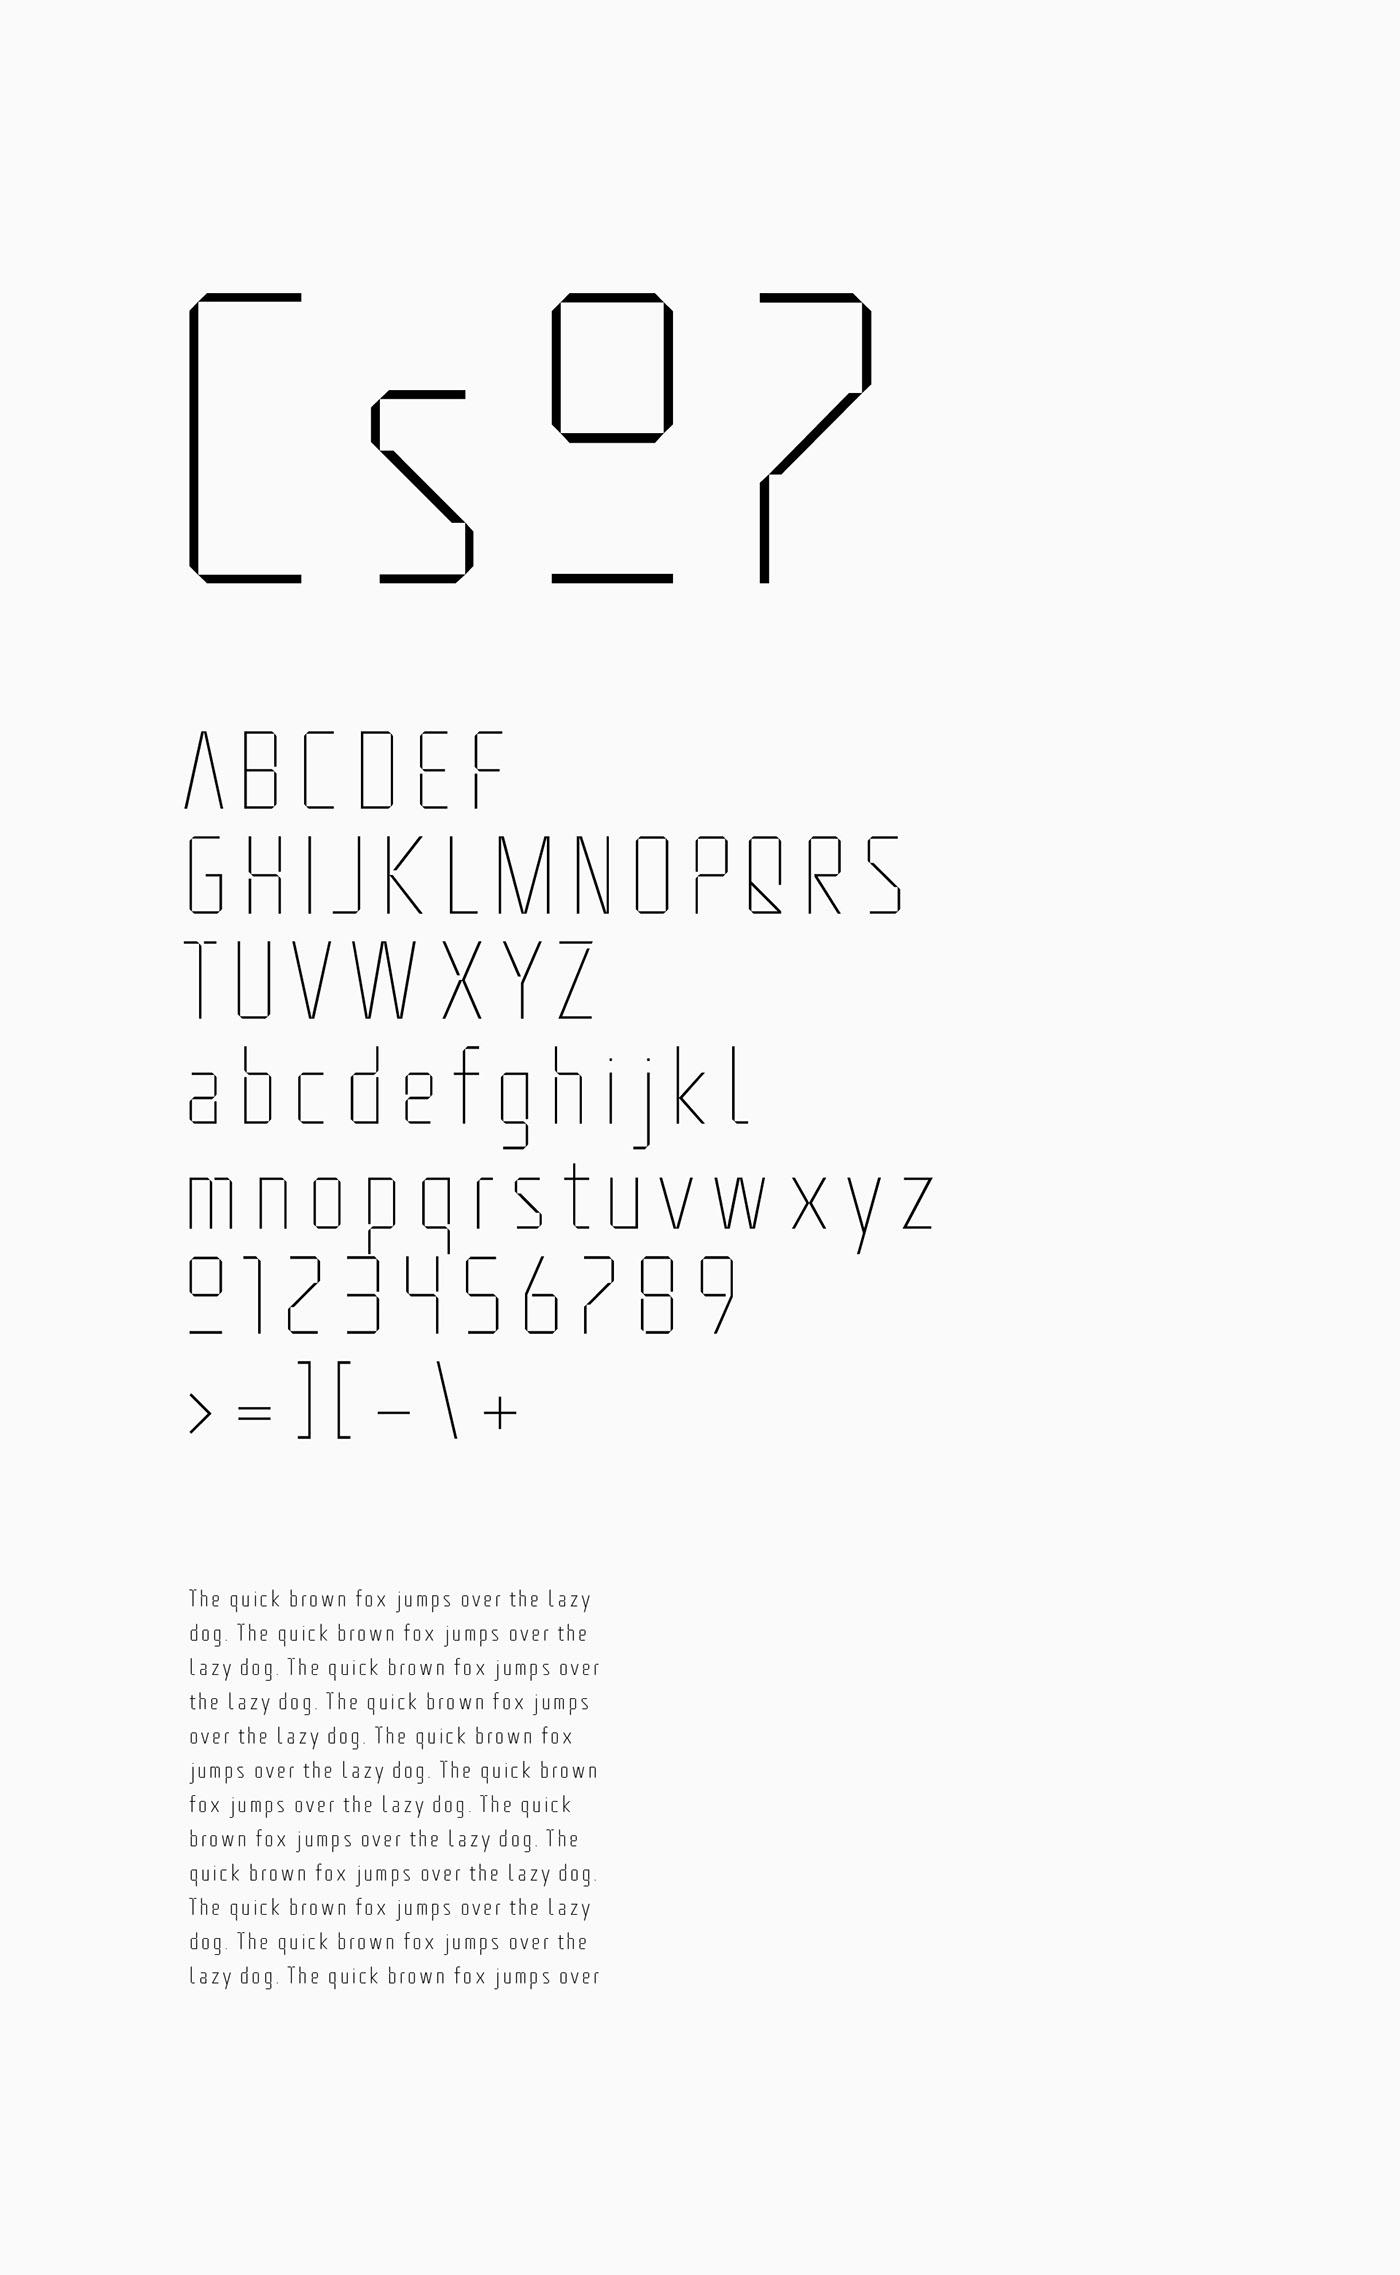 Image may contain: typography, screenshot and handwriting